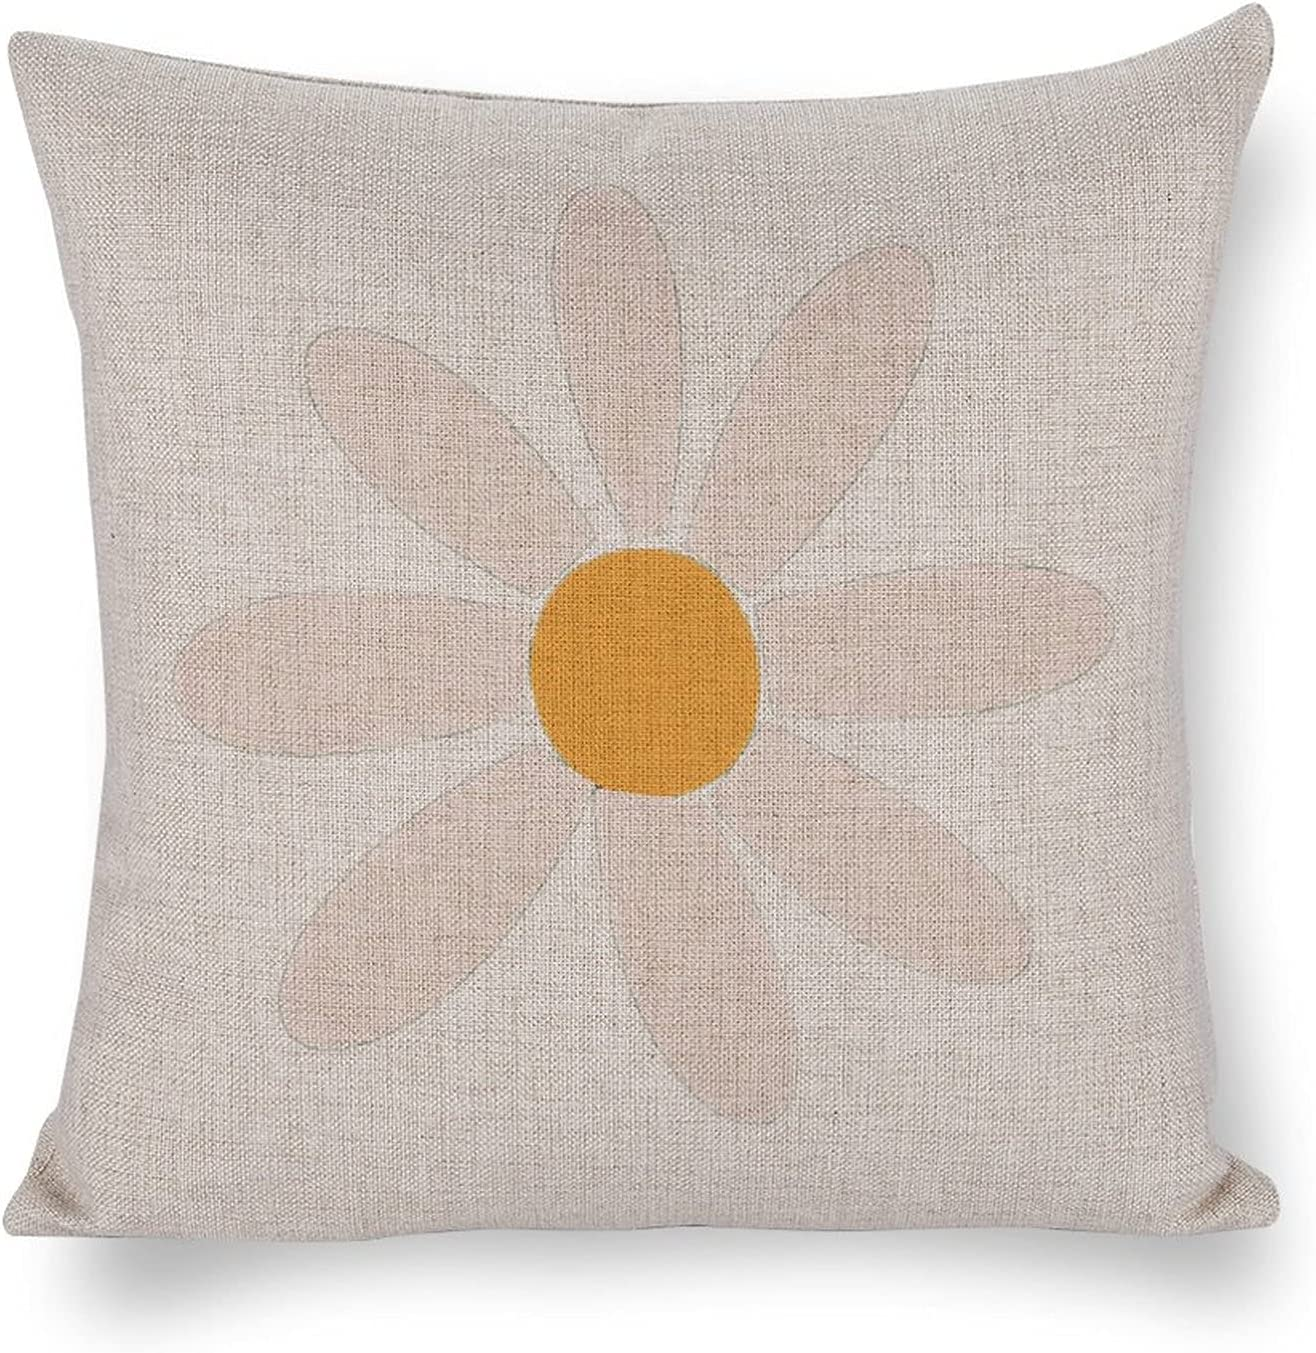 Some reservation UTF4C Petal Gesture Thumb Max 81% OFF Circle Flower Cushio Sofa Cotton Linen